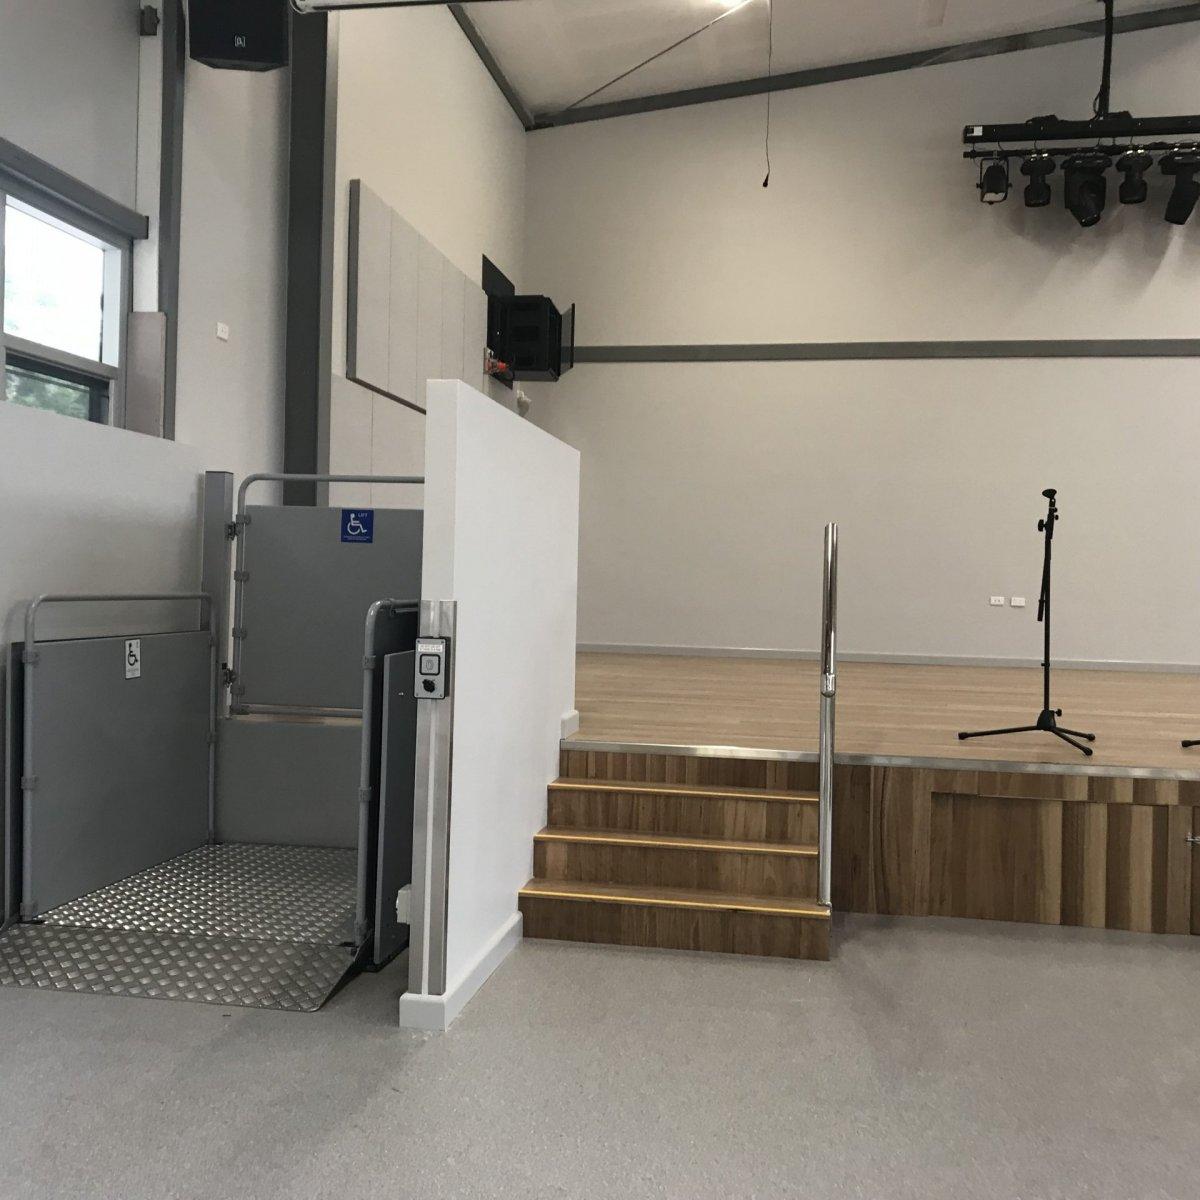 Vertical Platform Lift at stage Platform Lifts | Simplex Elevators Gallery Image 5